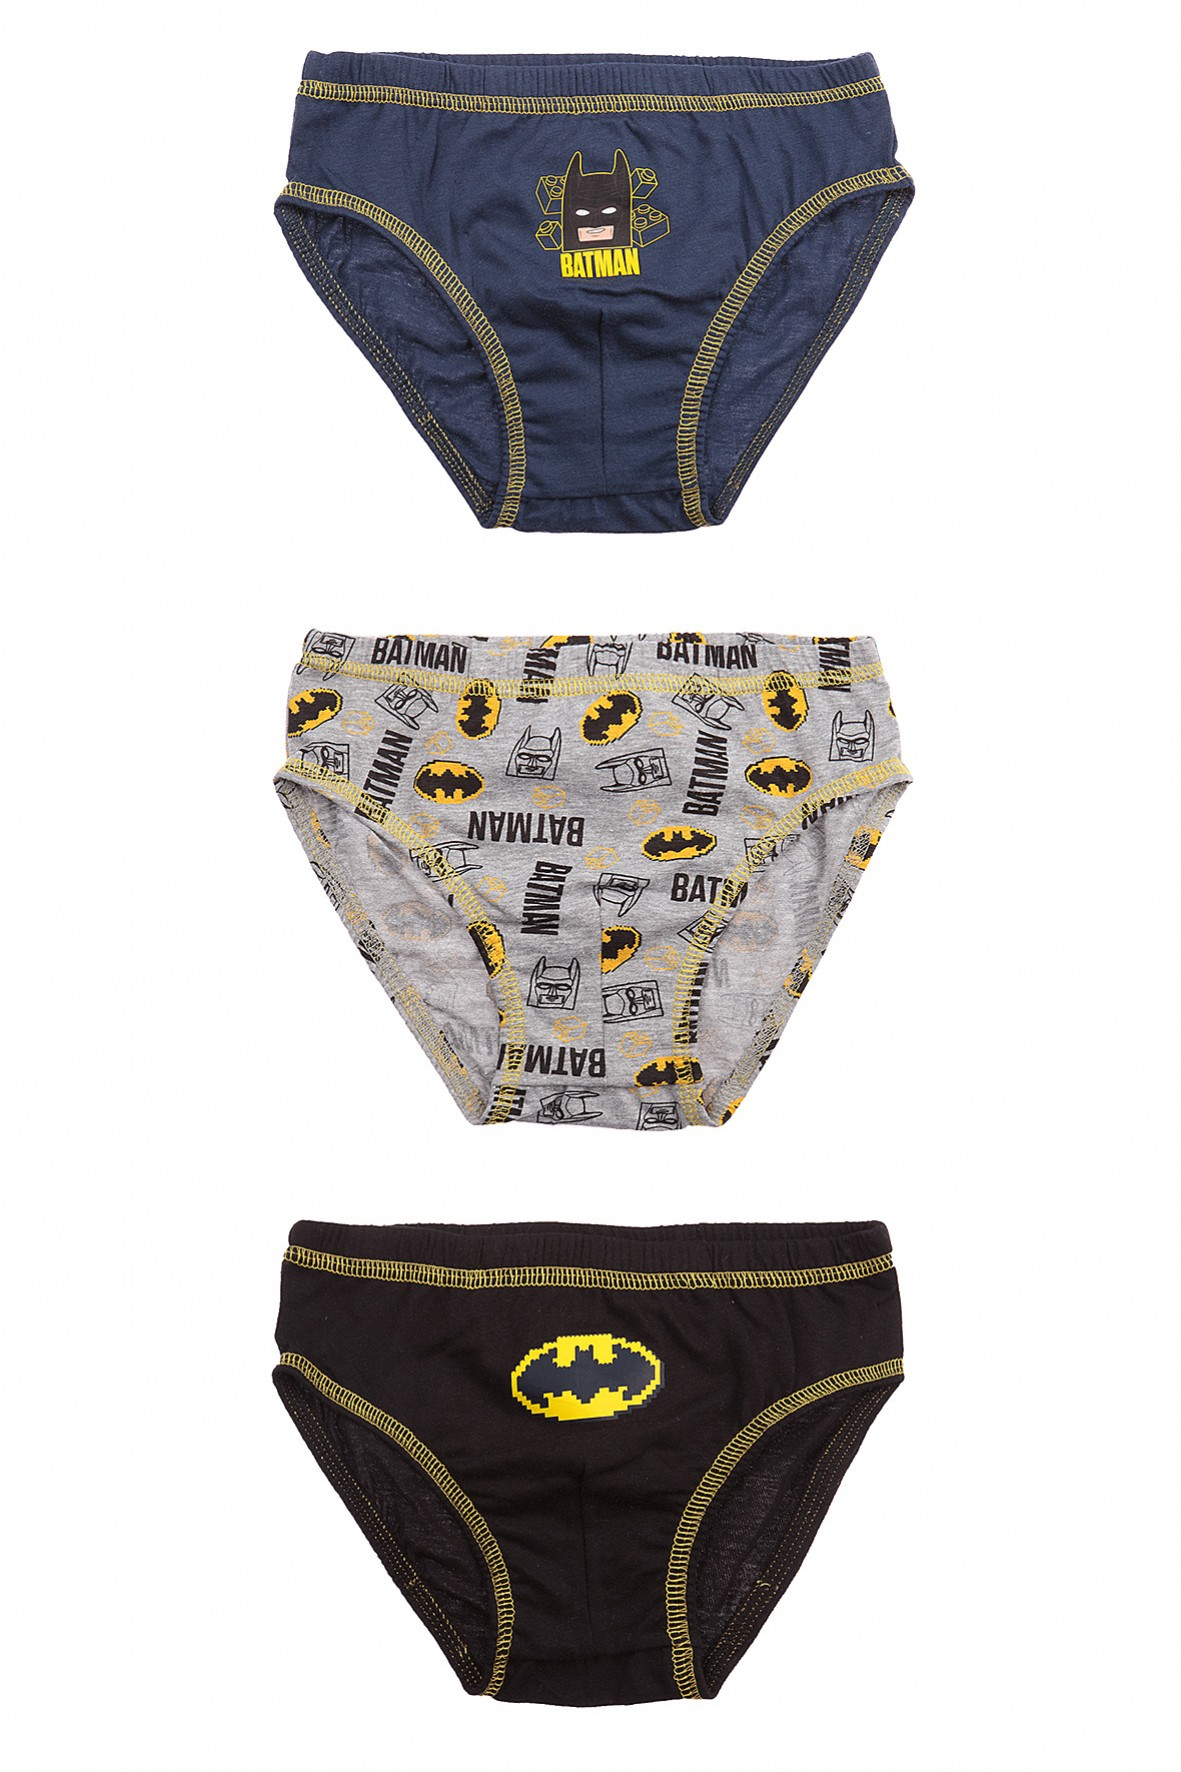 Majtki chłopięce Batman 3sztuki